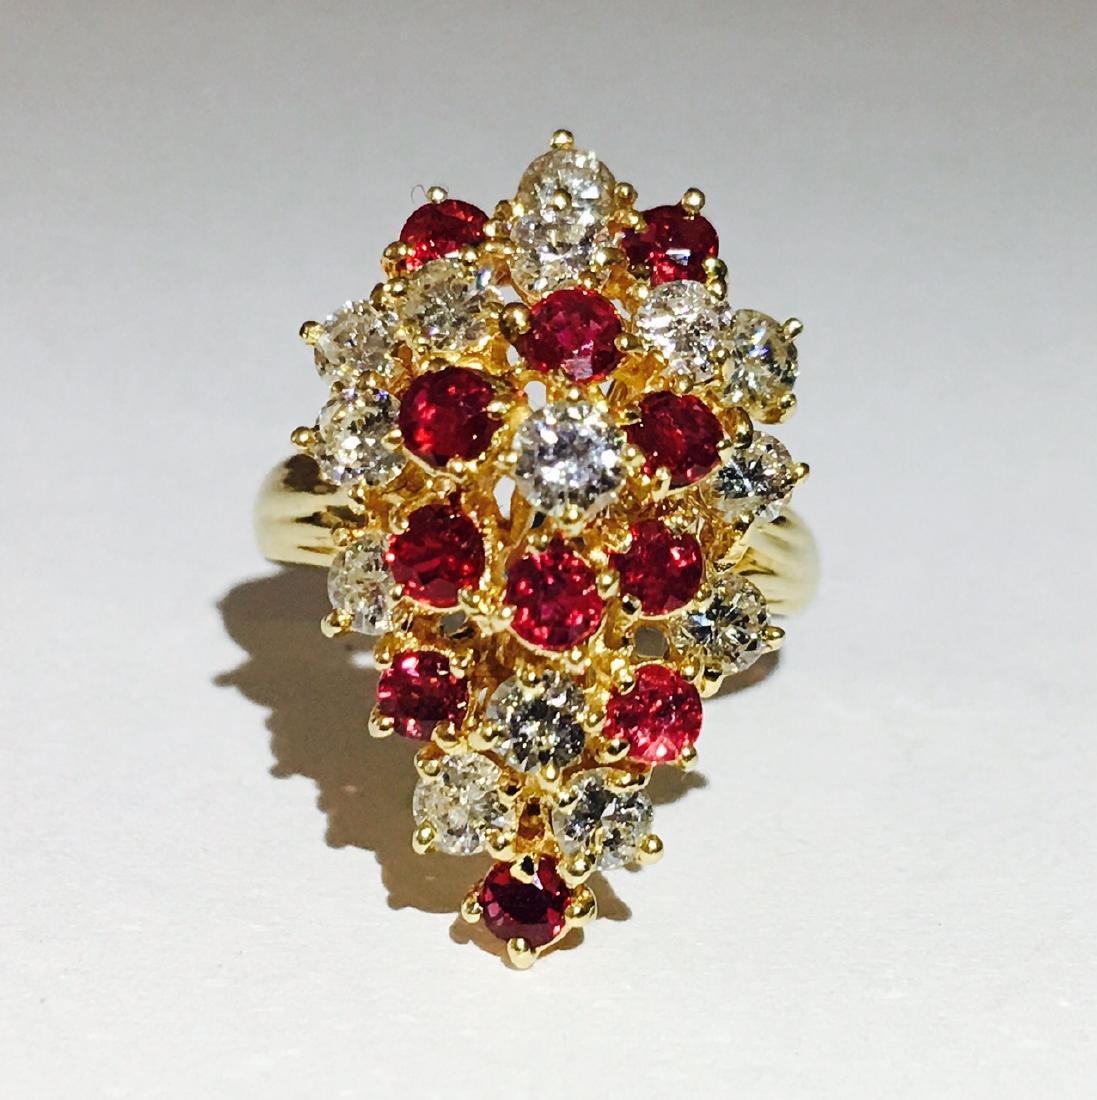 14K Gold, Cocktail RUBY& DIAMOND Ring